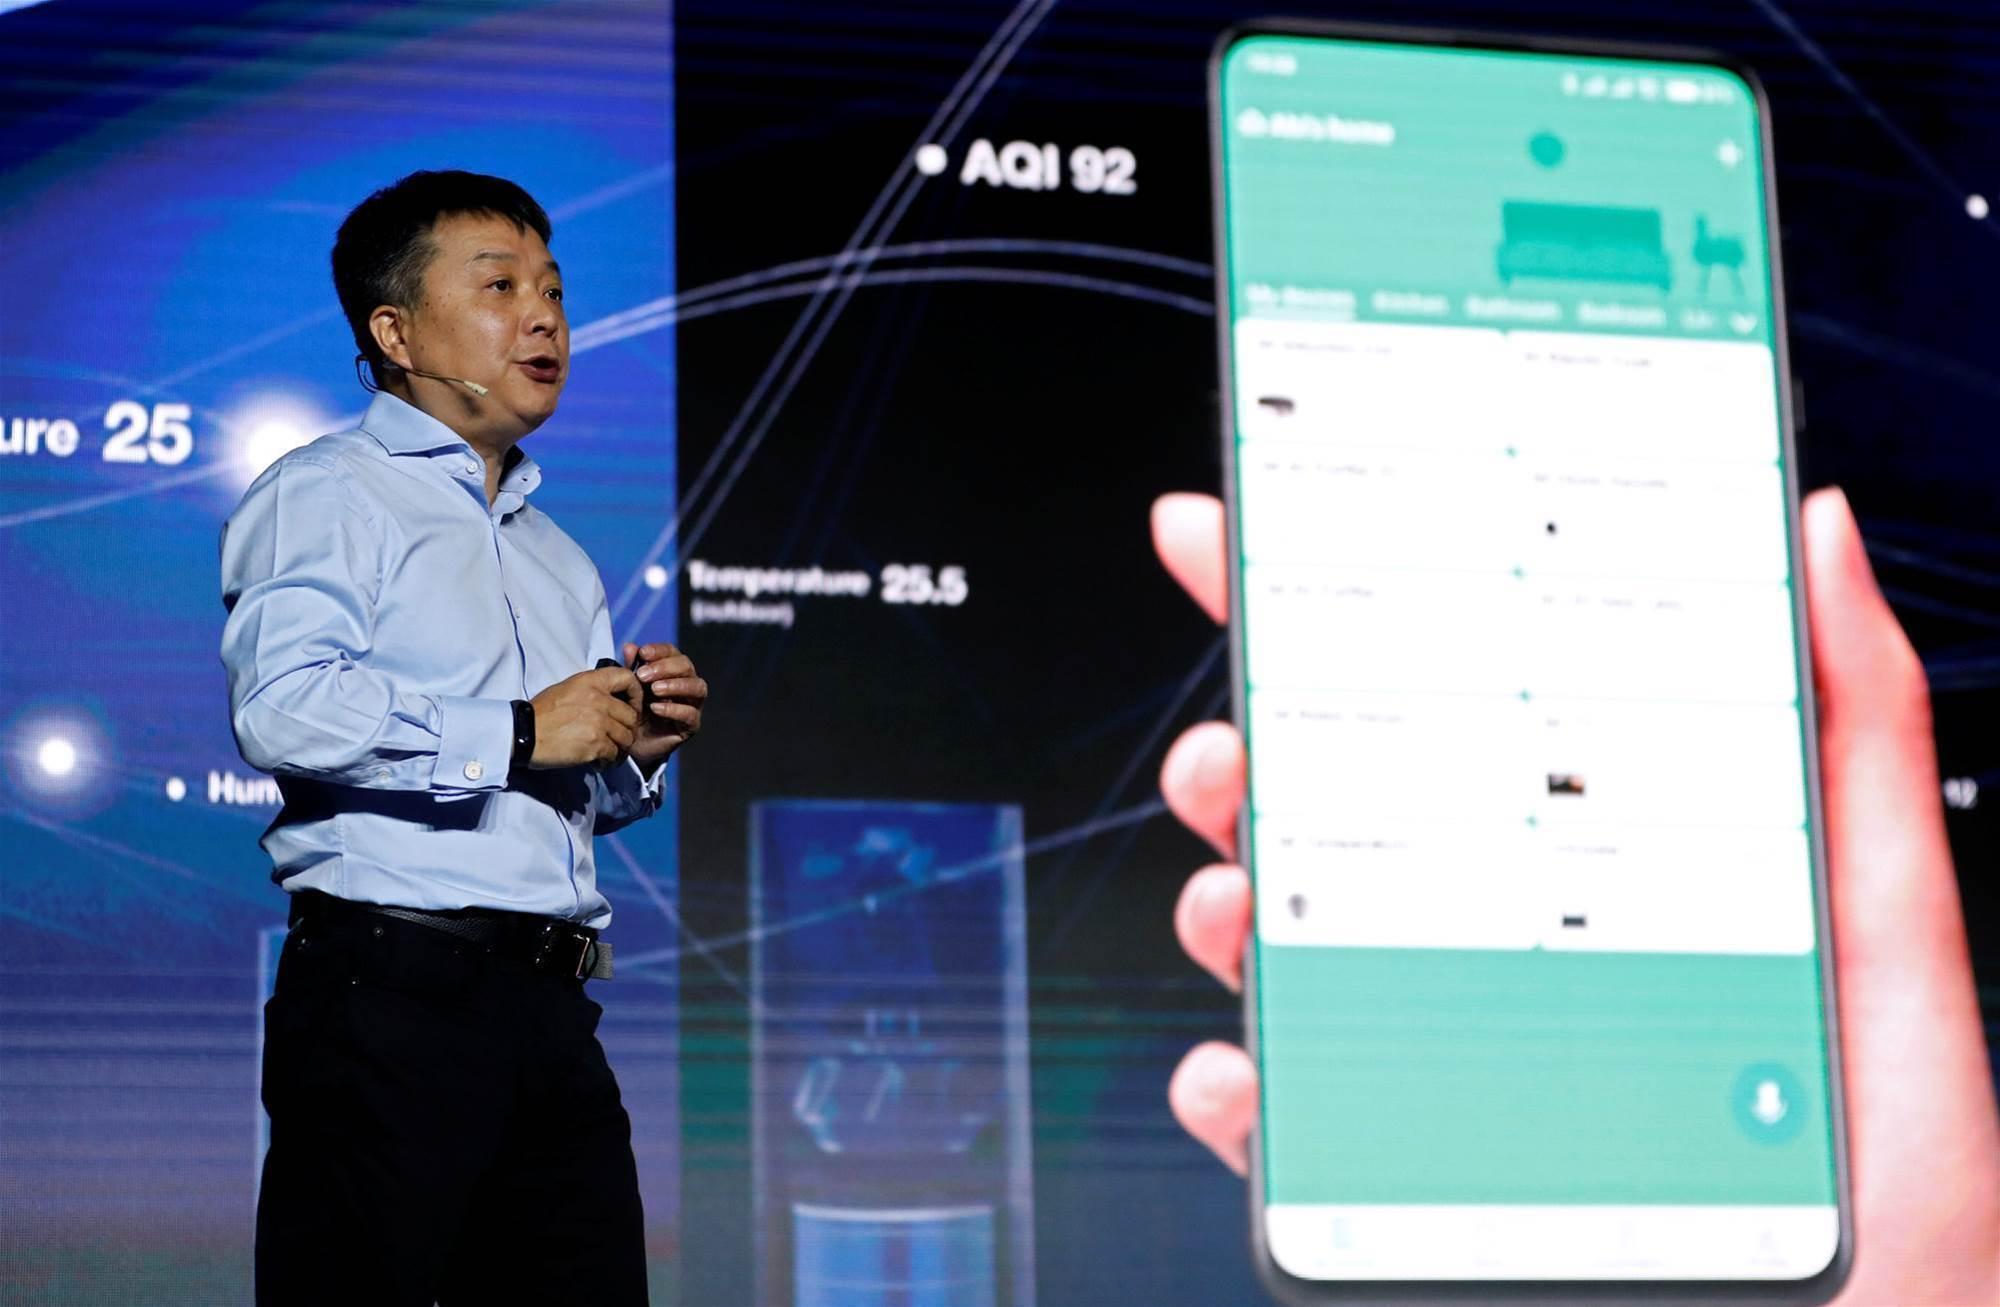 China's Xiaomi unveils US$680 5G smartphone